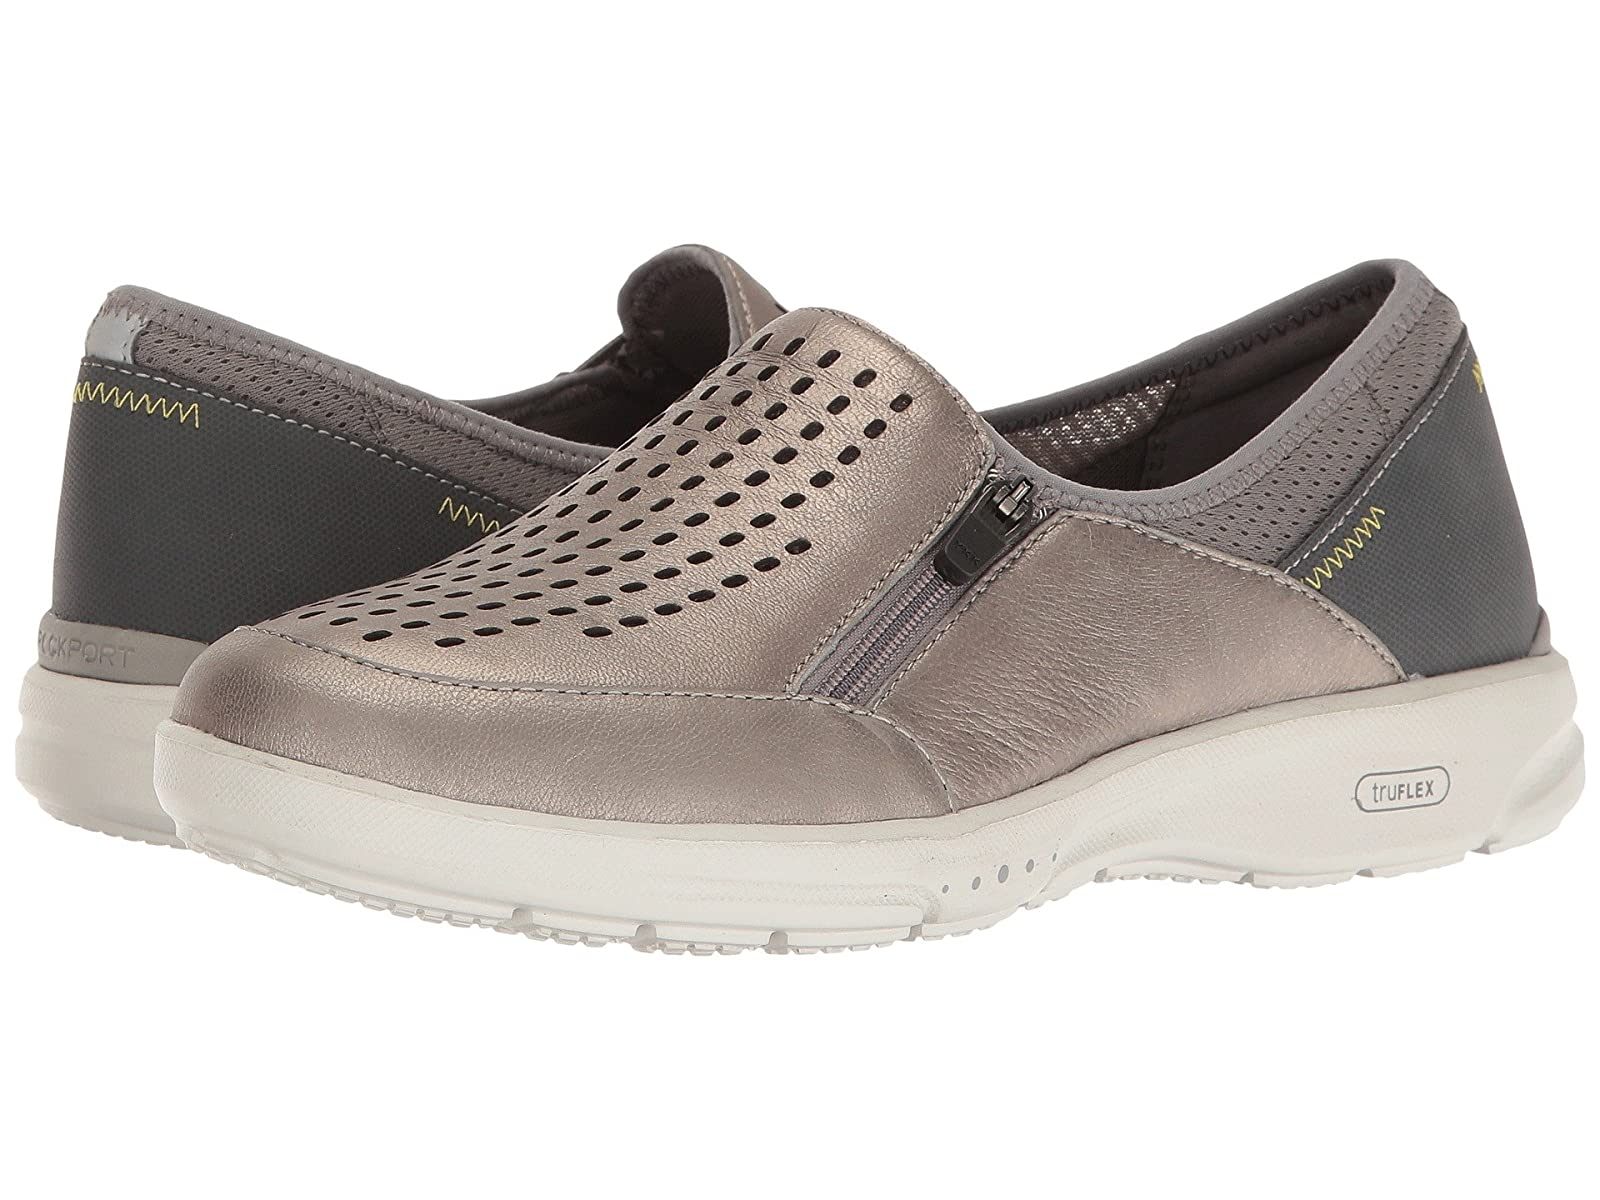 Rockport TruFlex Slip-OnCheap and distinctive eye-catching shoes